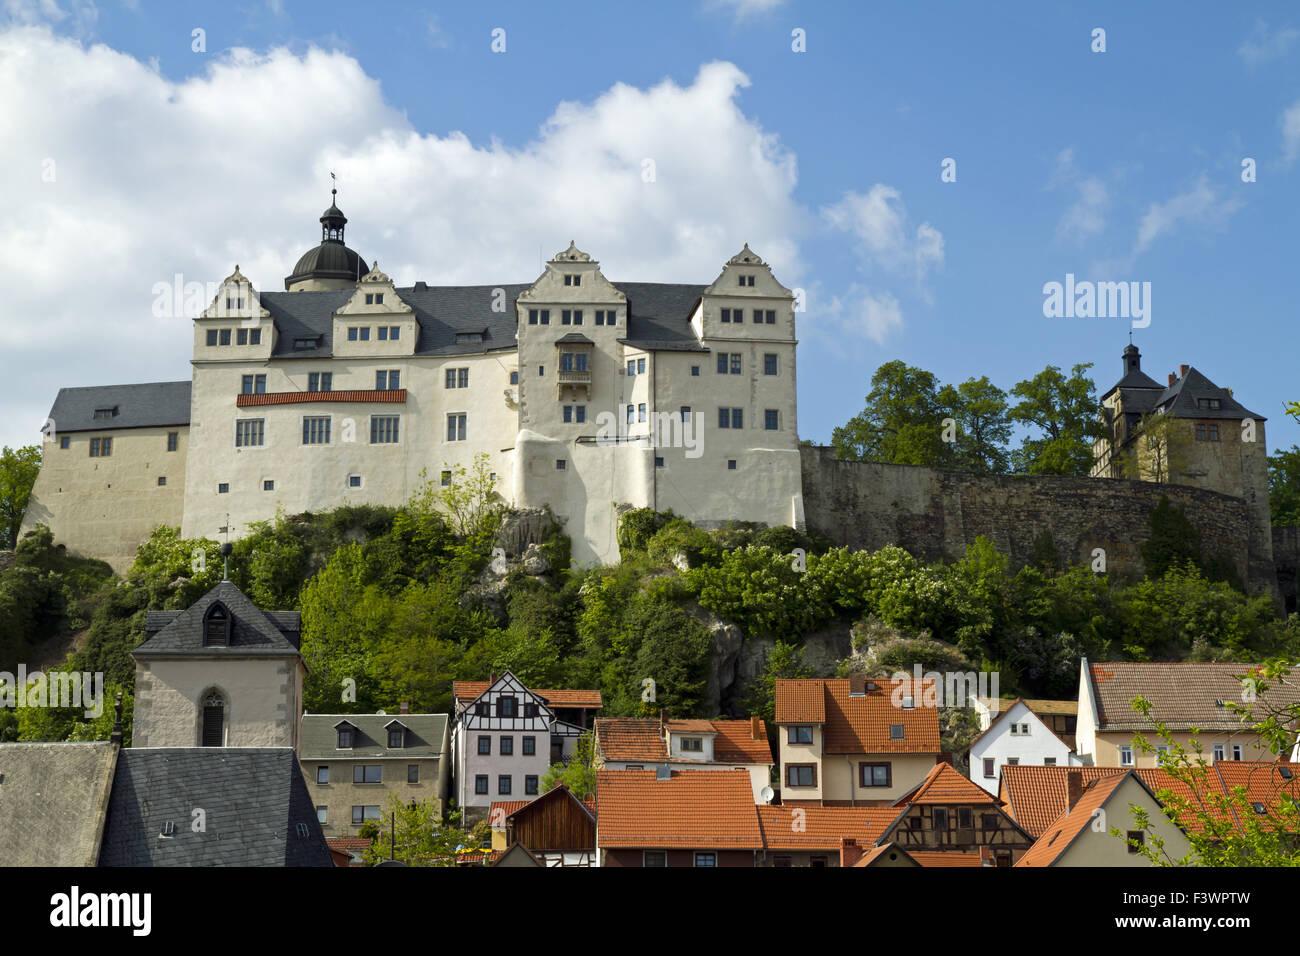 Ranis Castle, Thuringia, Germany - Stock Image